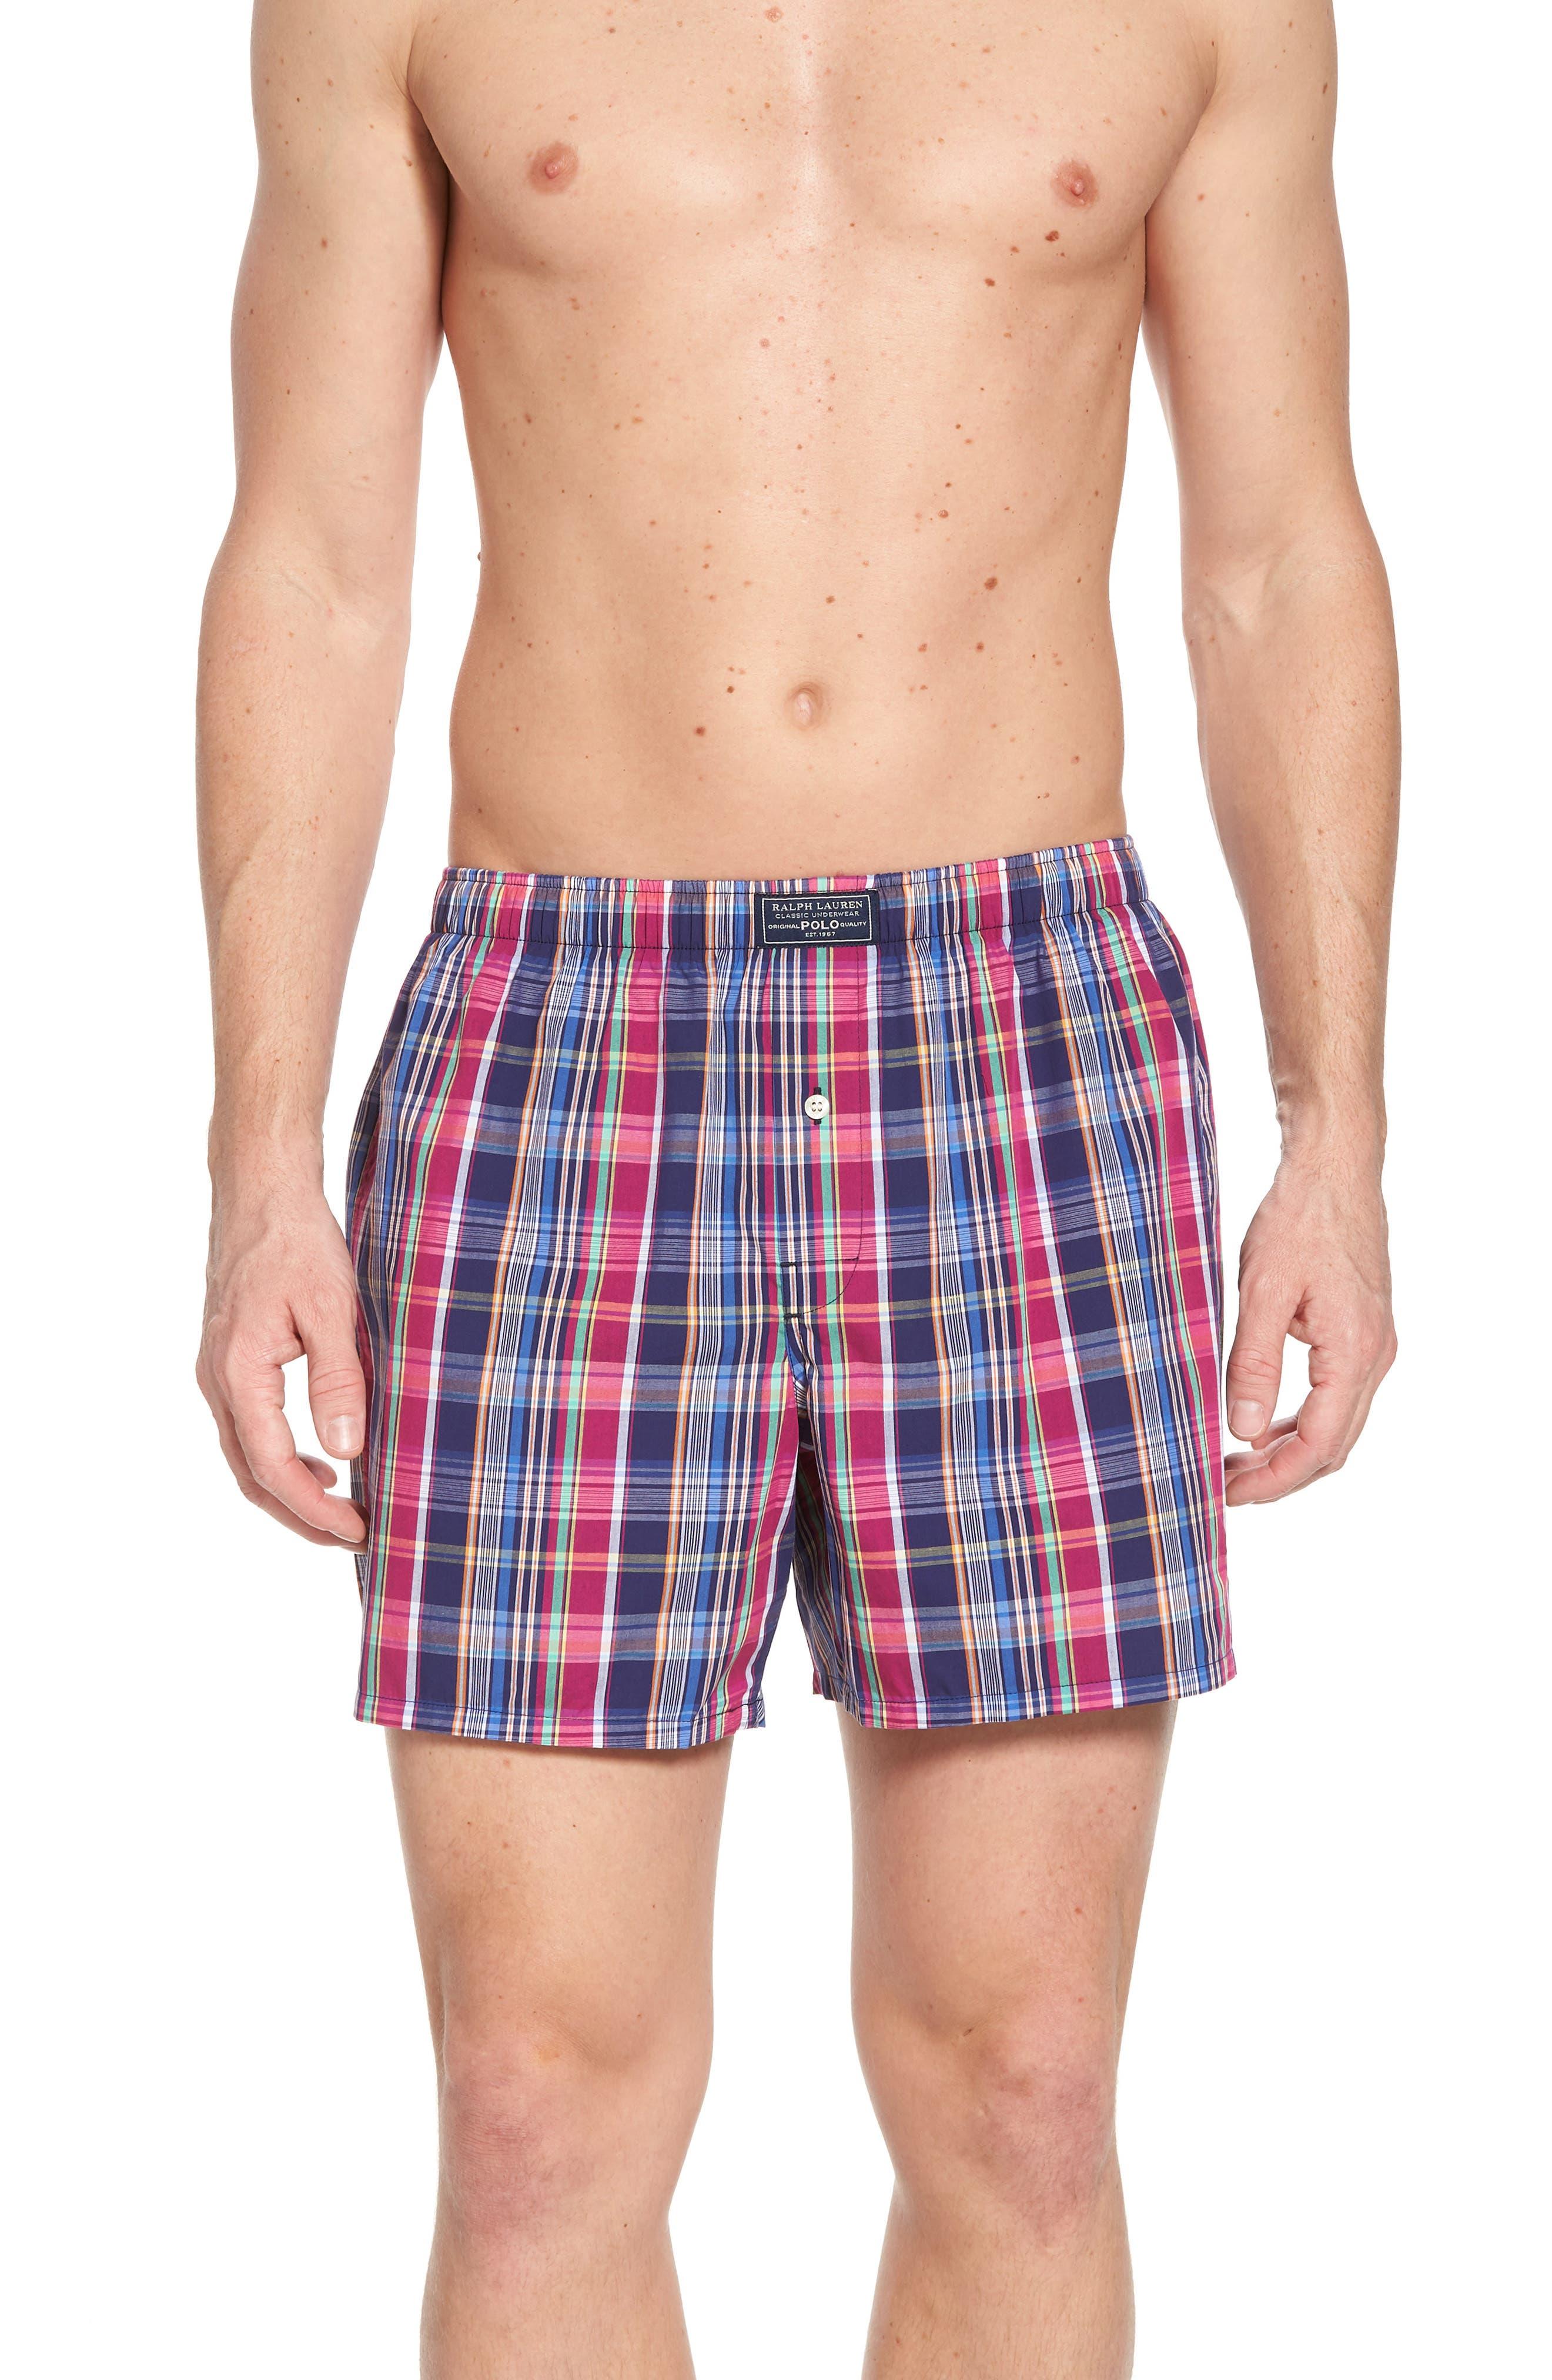 Woven Cotton Boxers,                             Main thumbnail 1, color,                             Collin Plaid/ Bright Pink